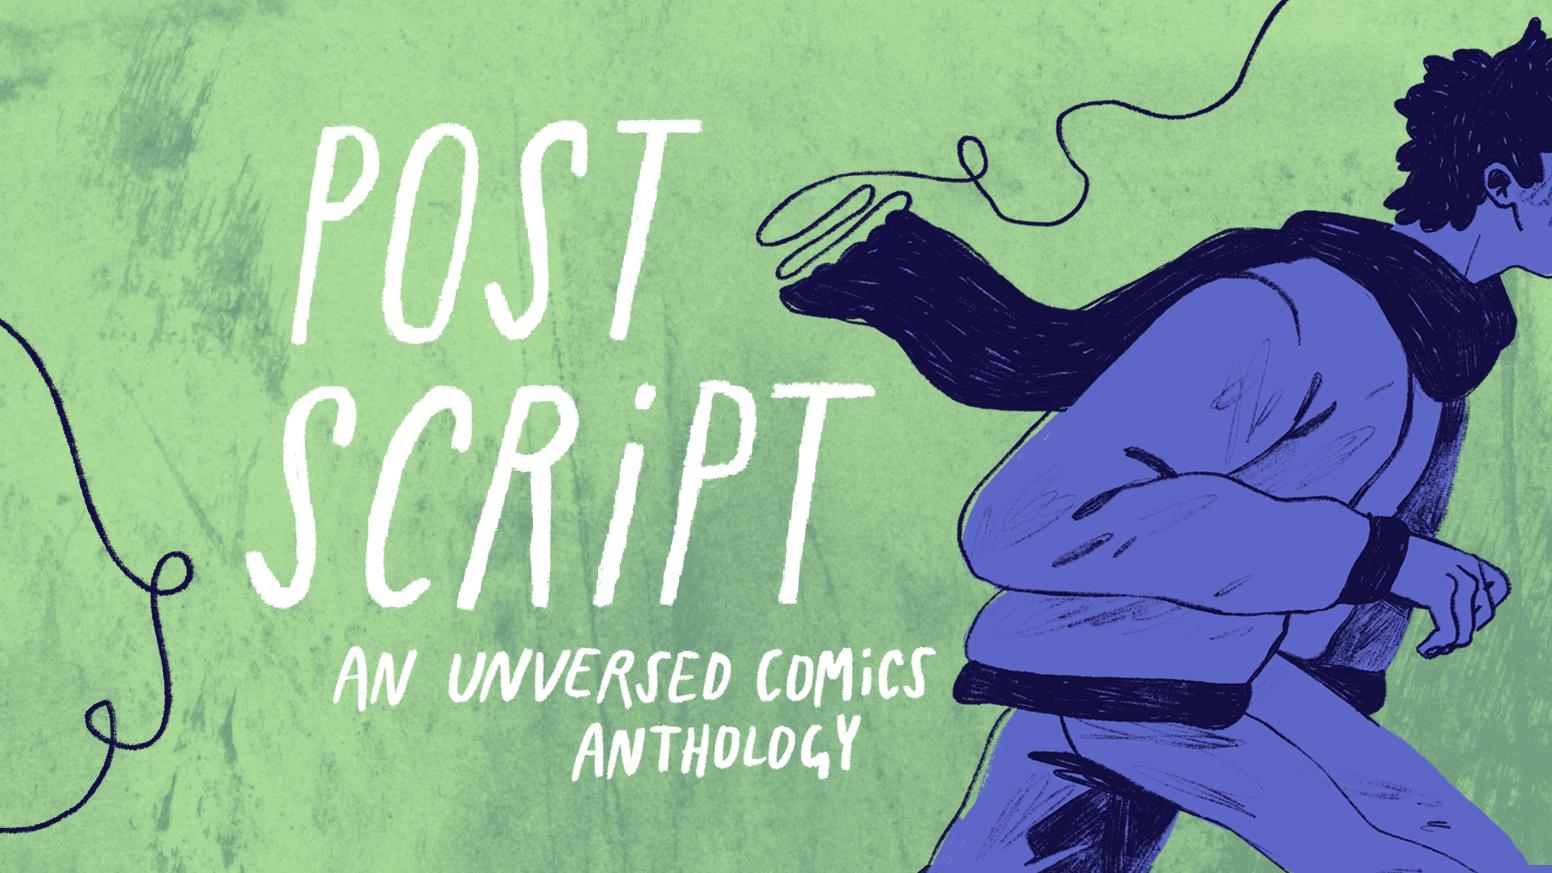 POSTSCRIPT: An Unversed Comics Anthology by Jonathan Hill